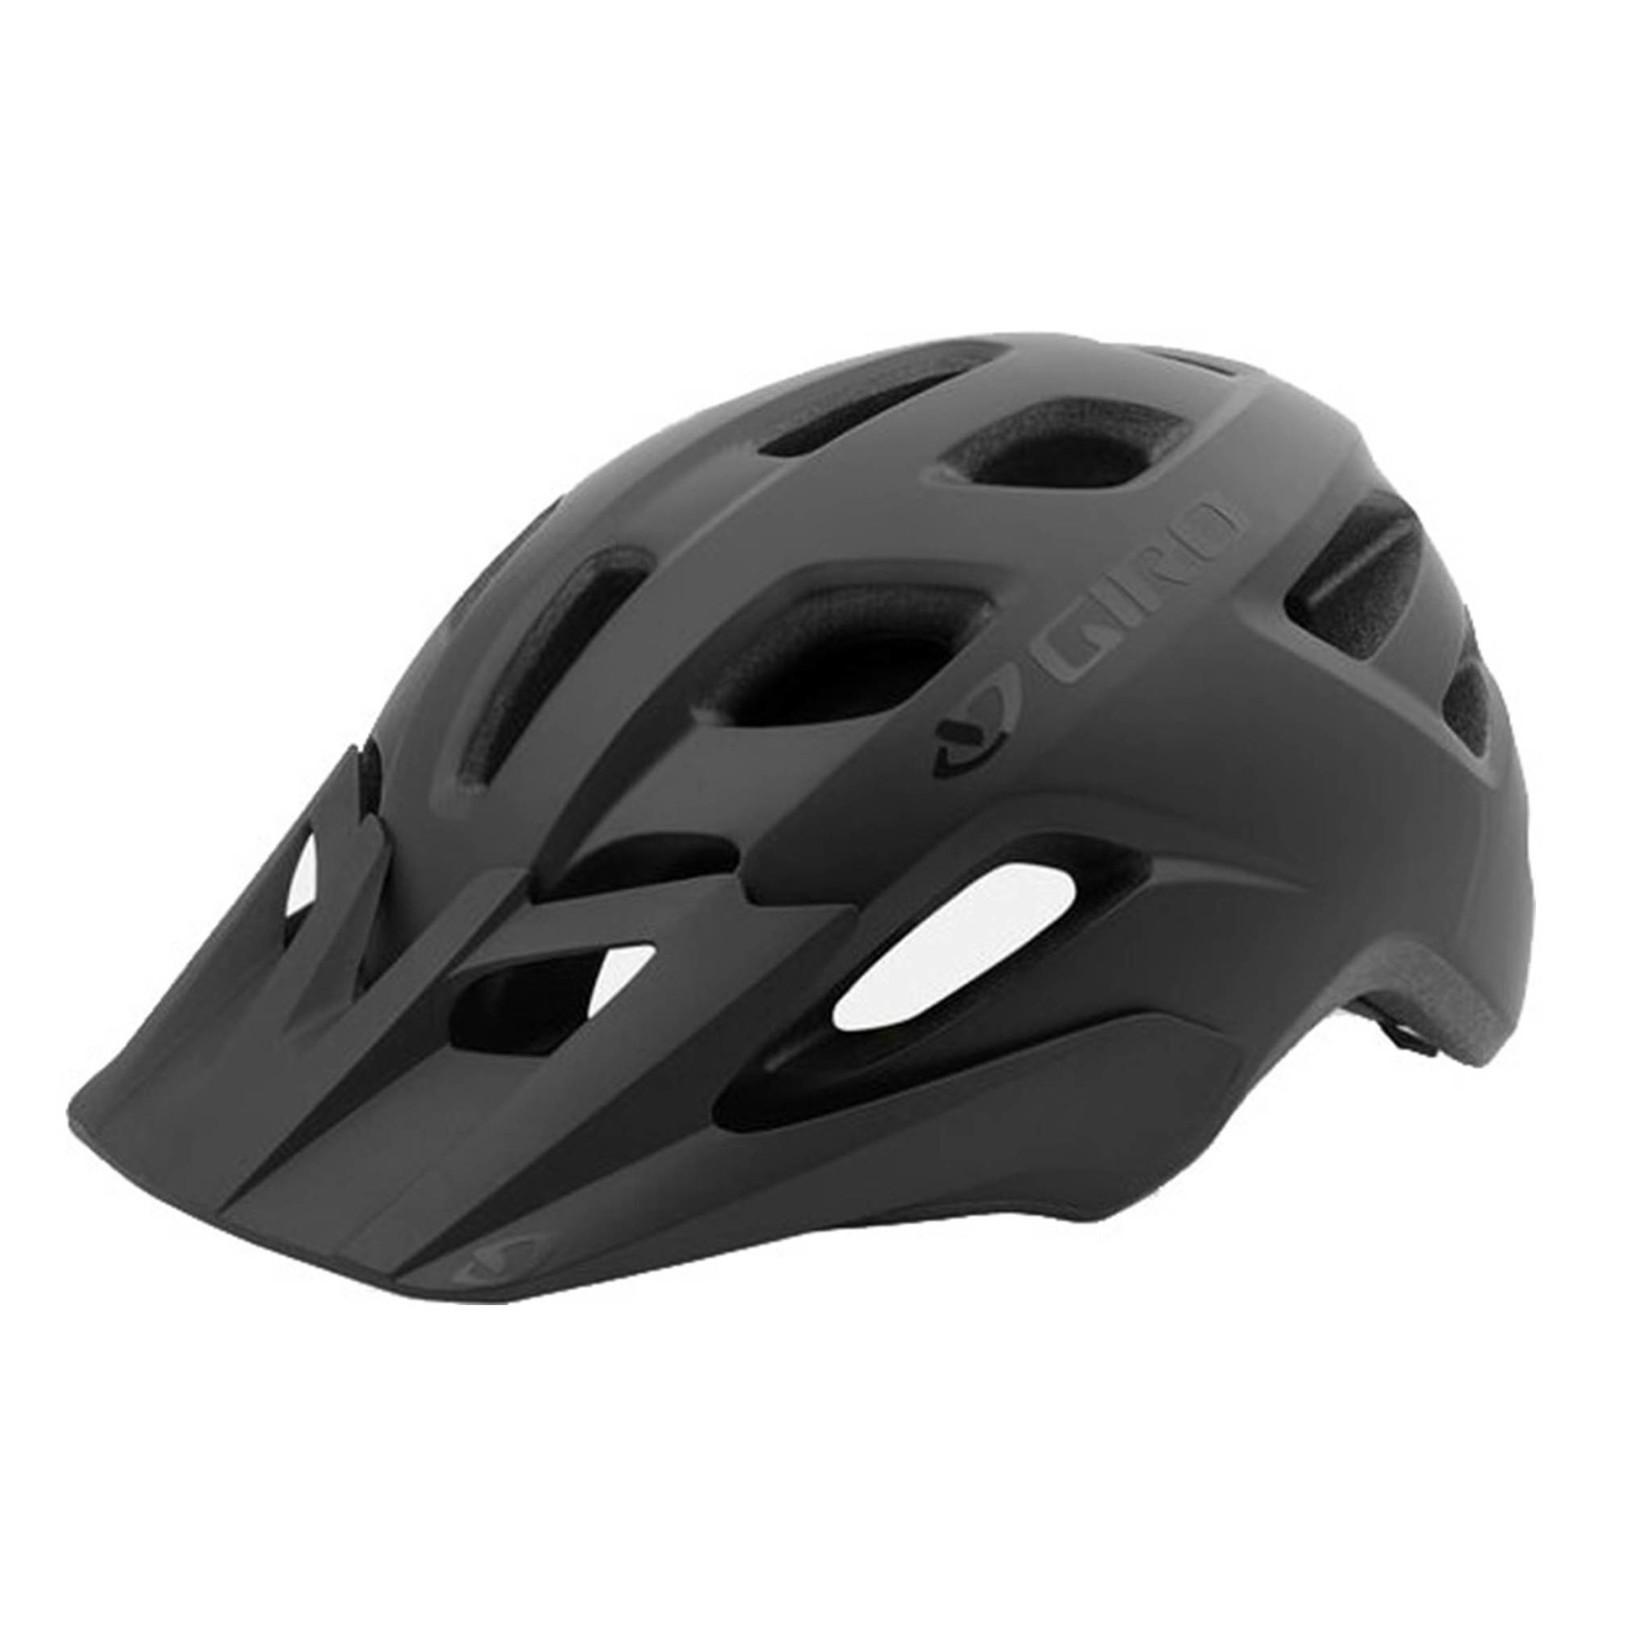 Giro Fixture Helmet UXL Onesize Black